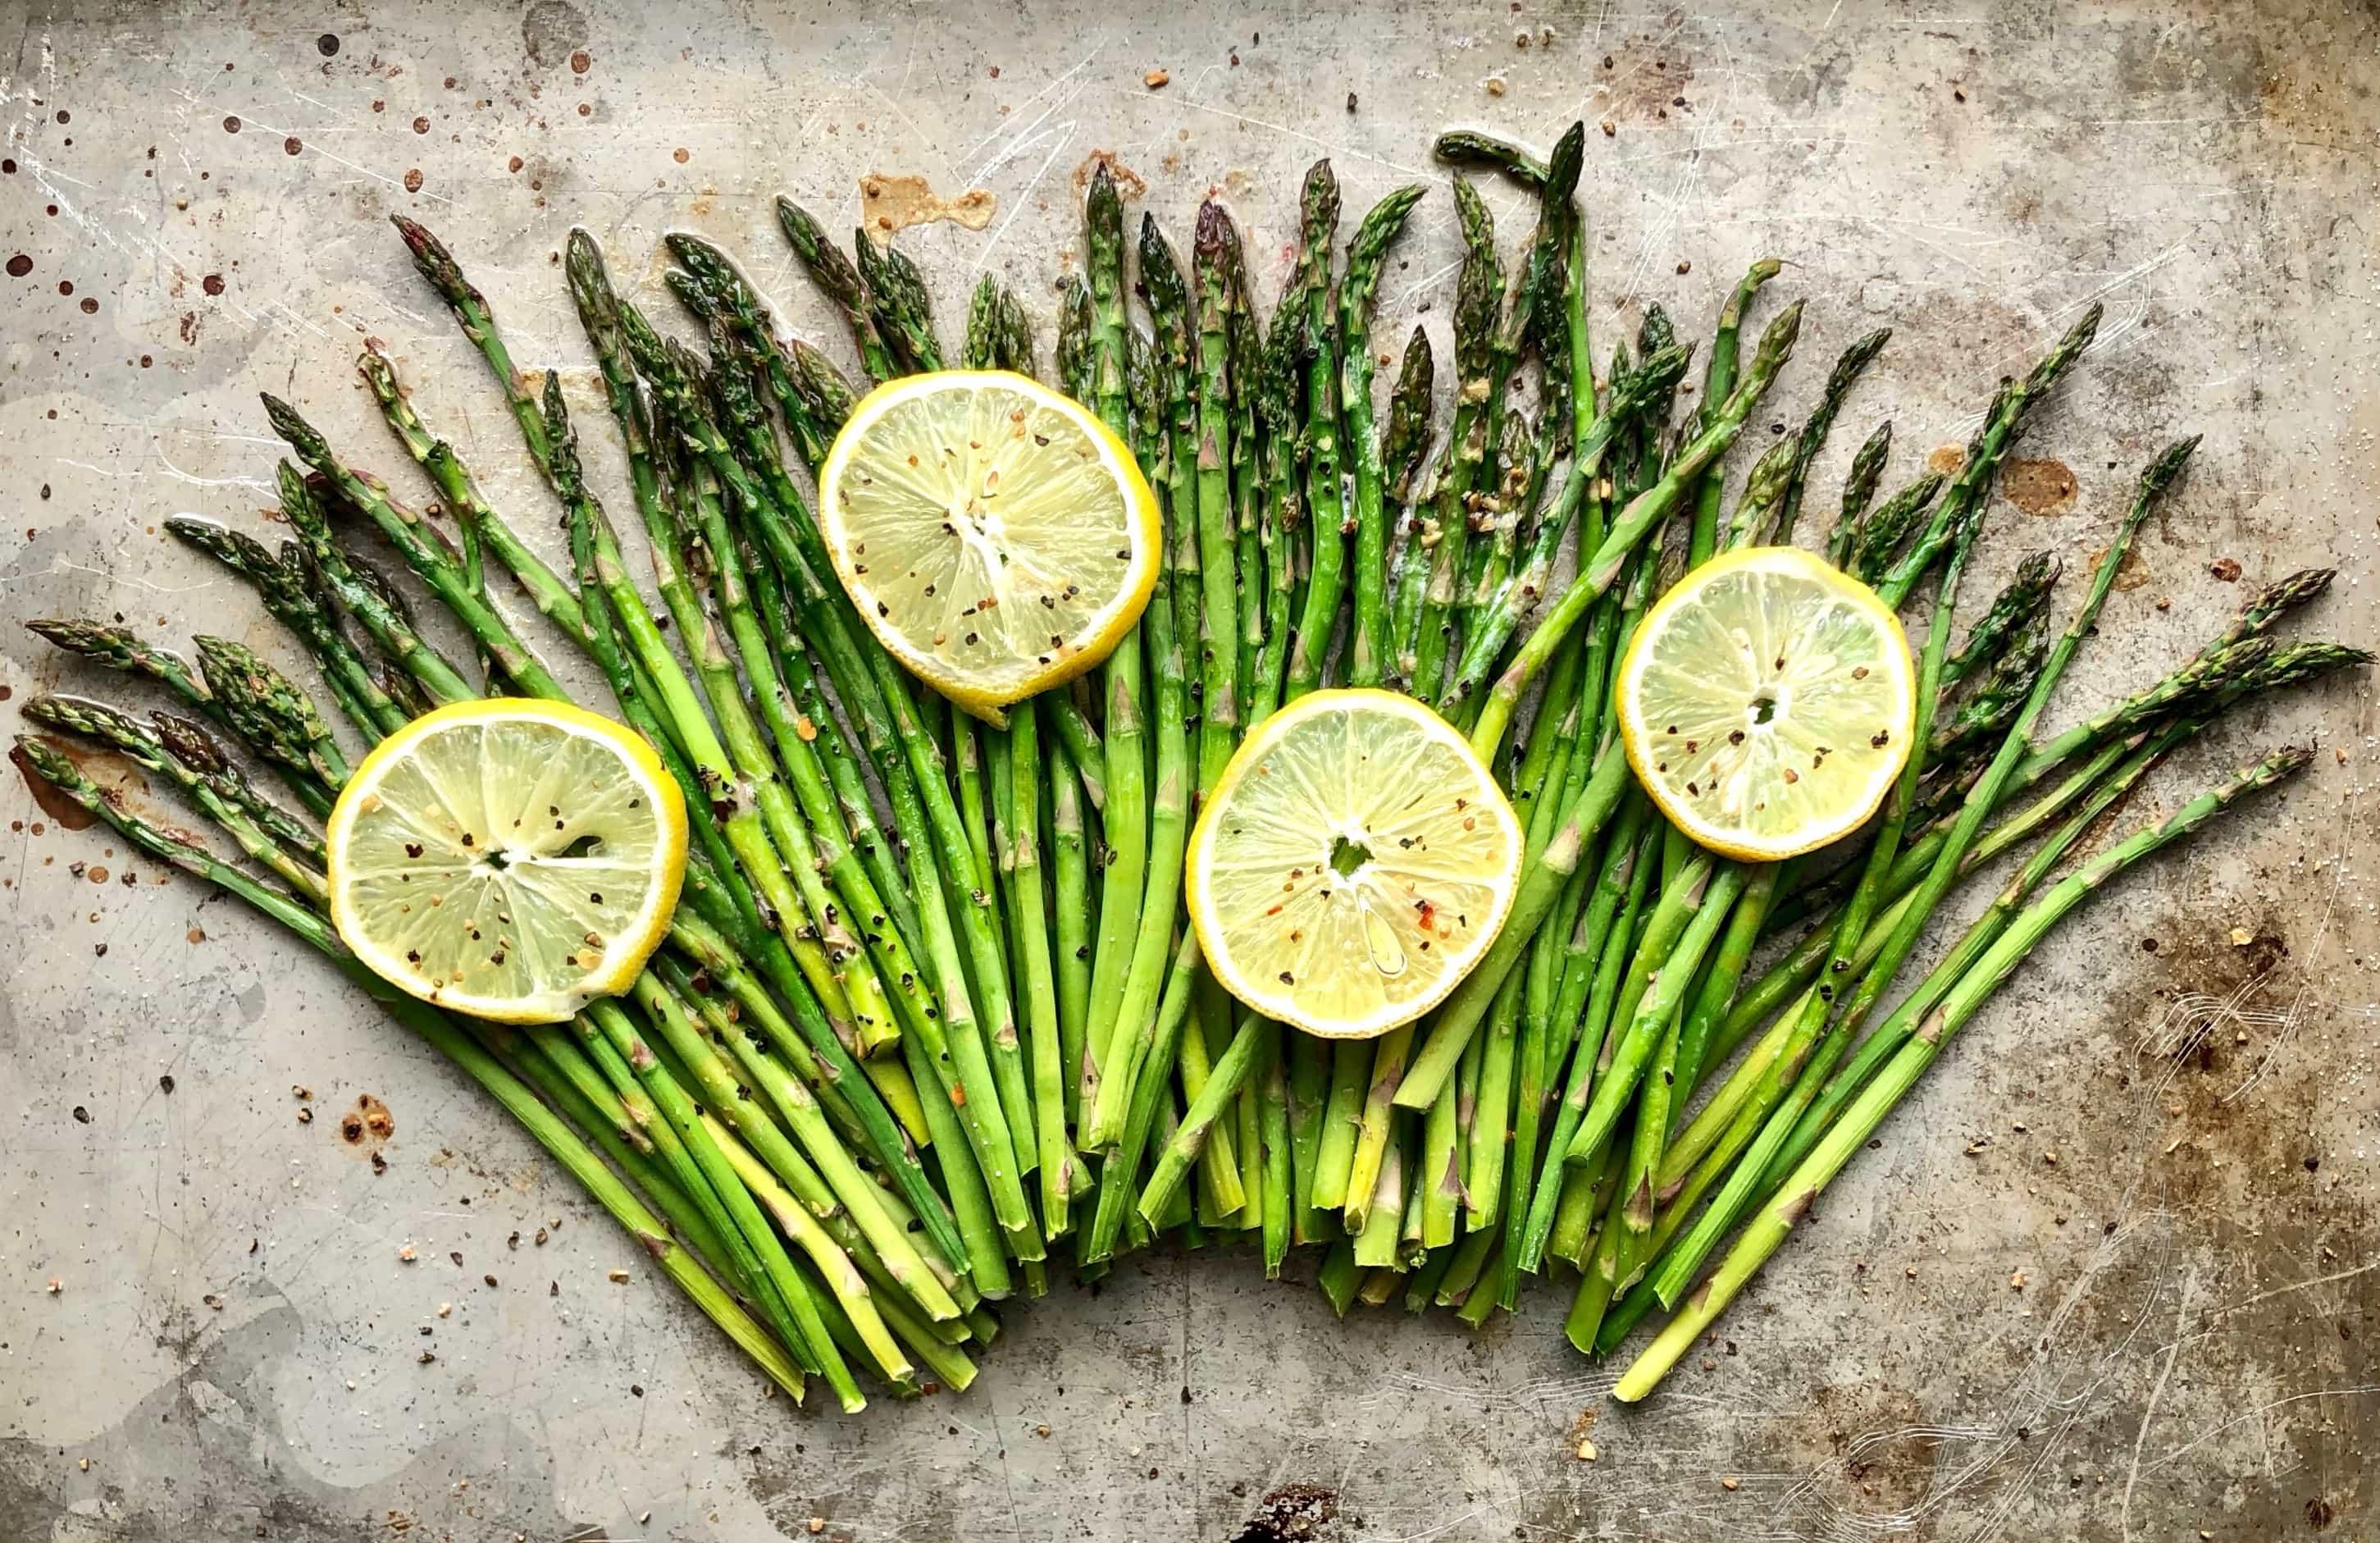 lemon butter asparagus on a pan with lemons on top